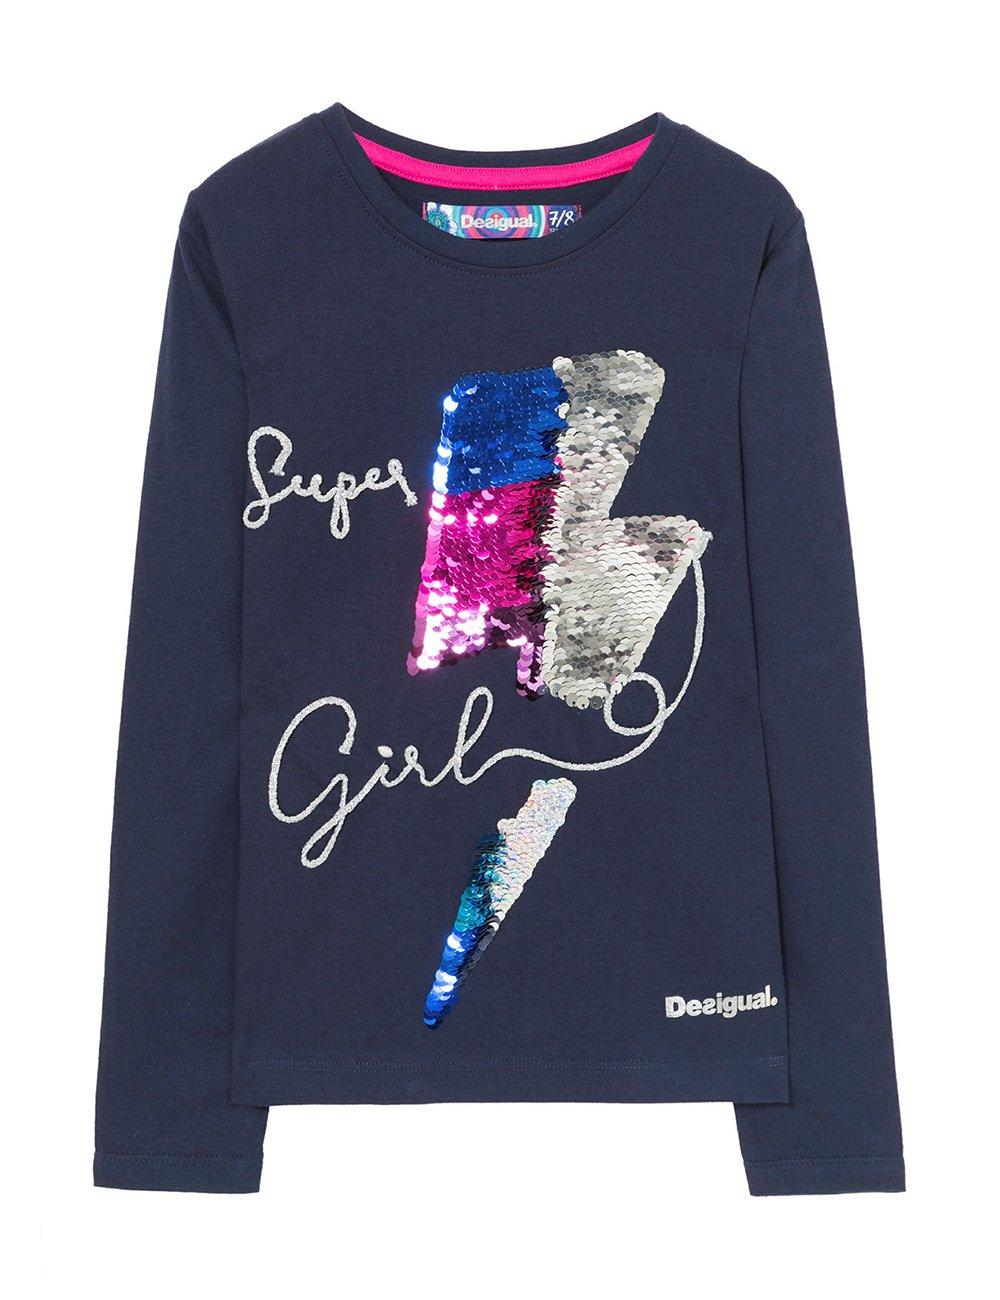 Desigual TS_Hamilton Camisa Manga Larga para Niñas